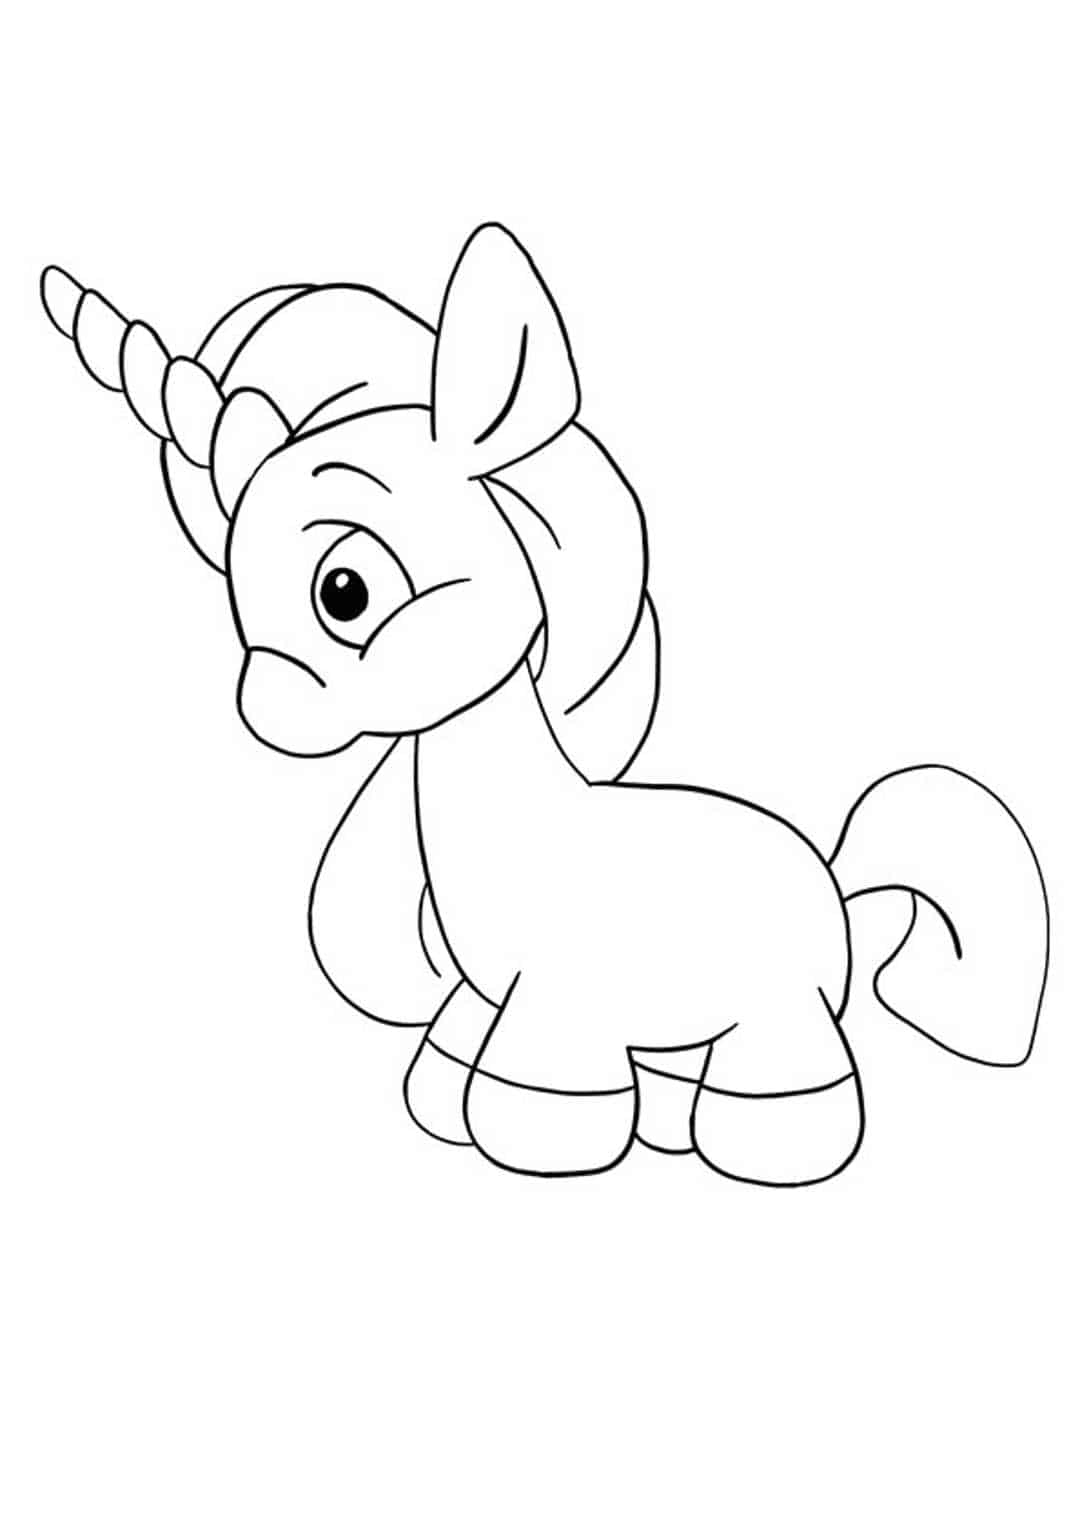 Coloriage petite licorne